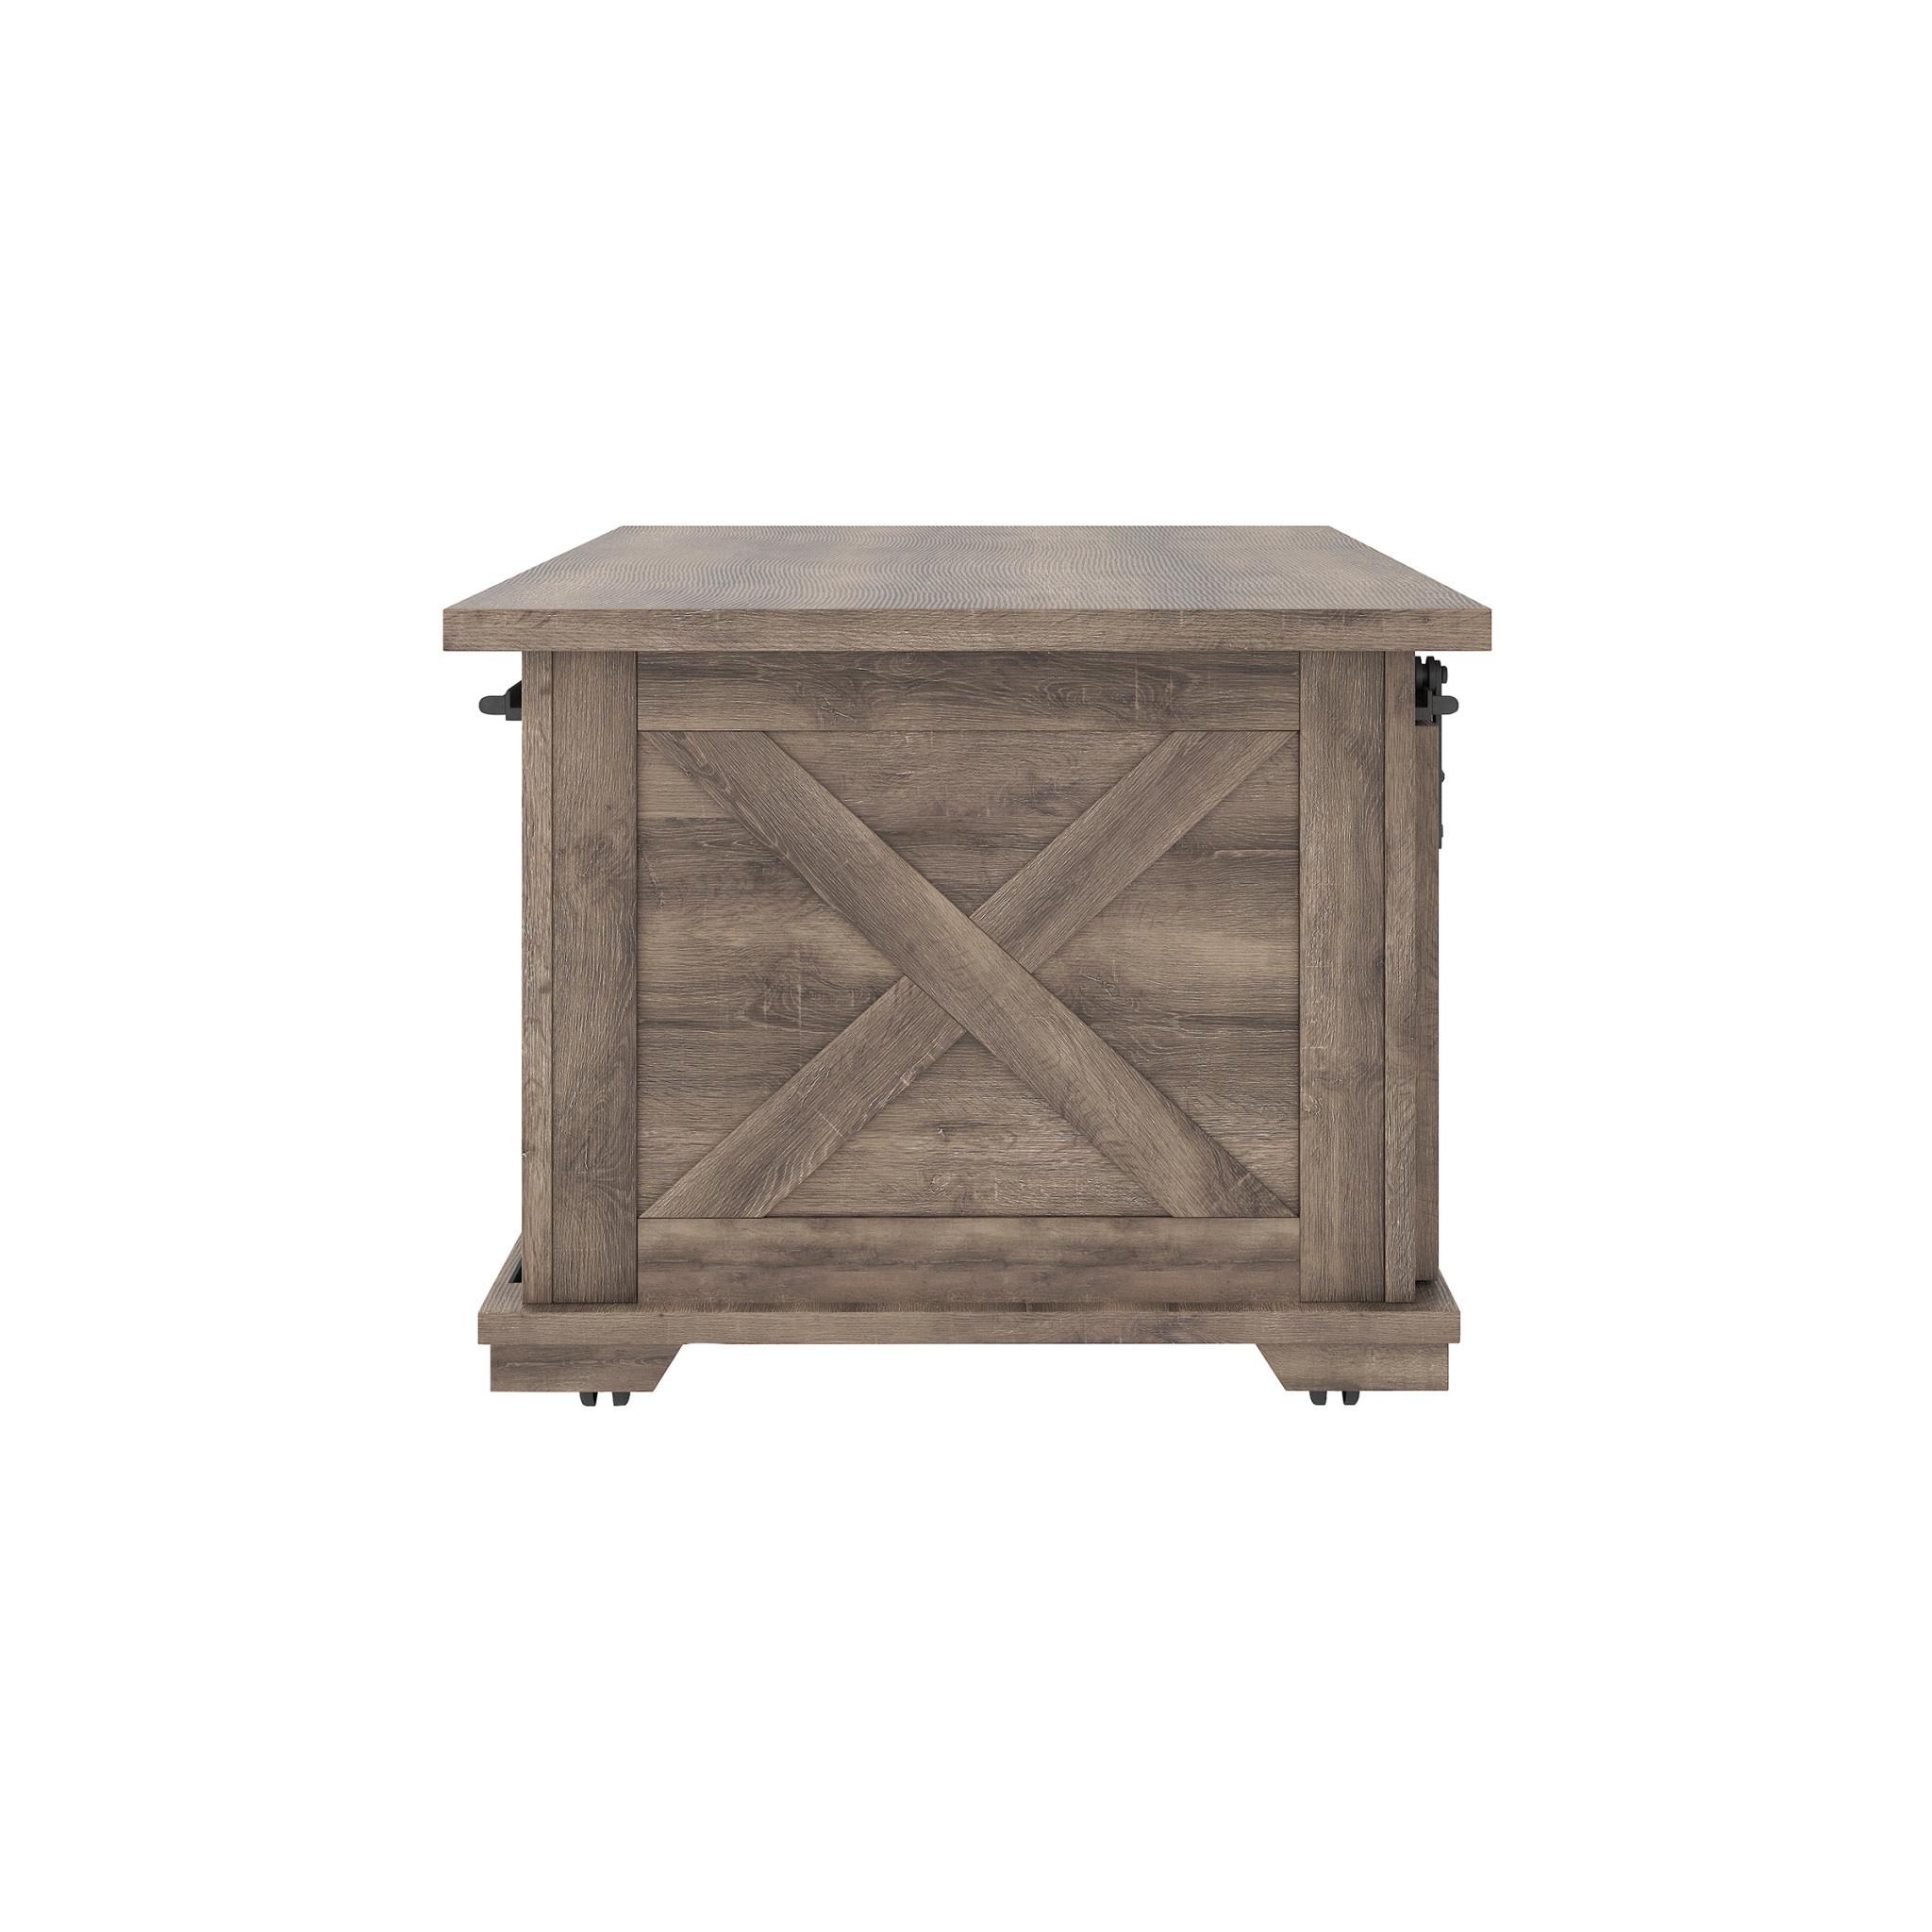 "Benchcraft ""Arelenbry"" Rectangular Cocktail Table- Gray T275-1"